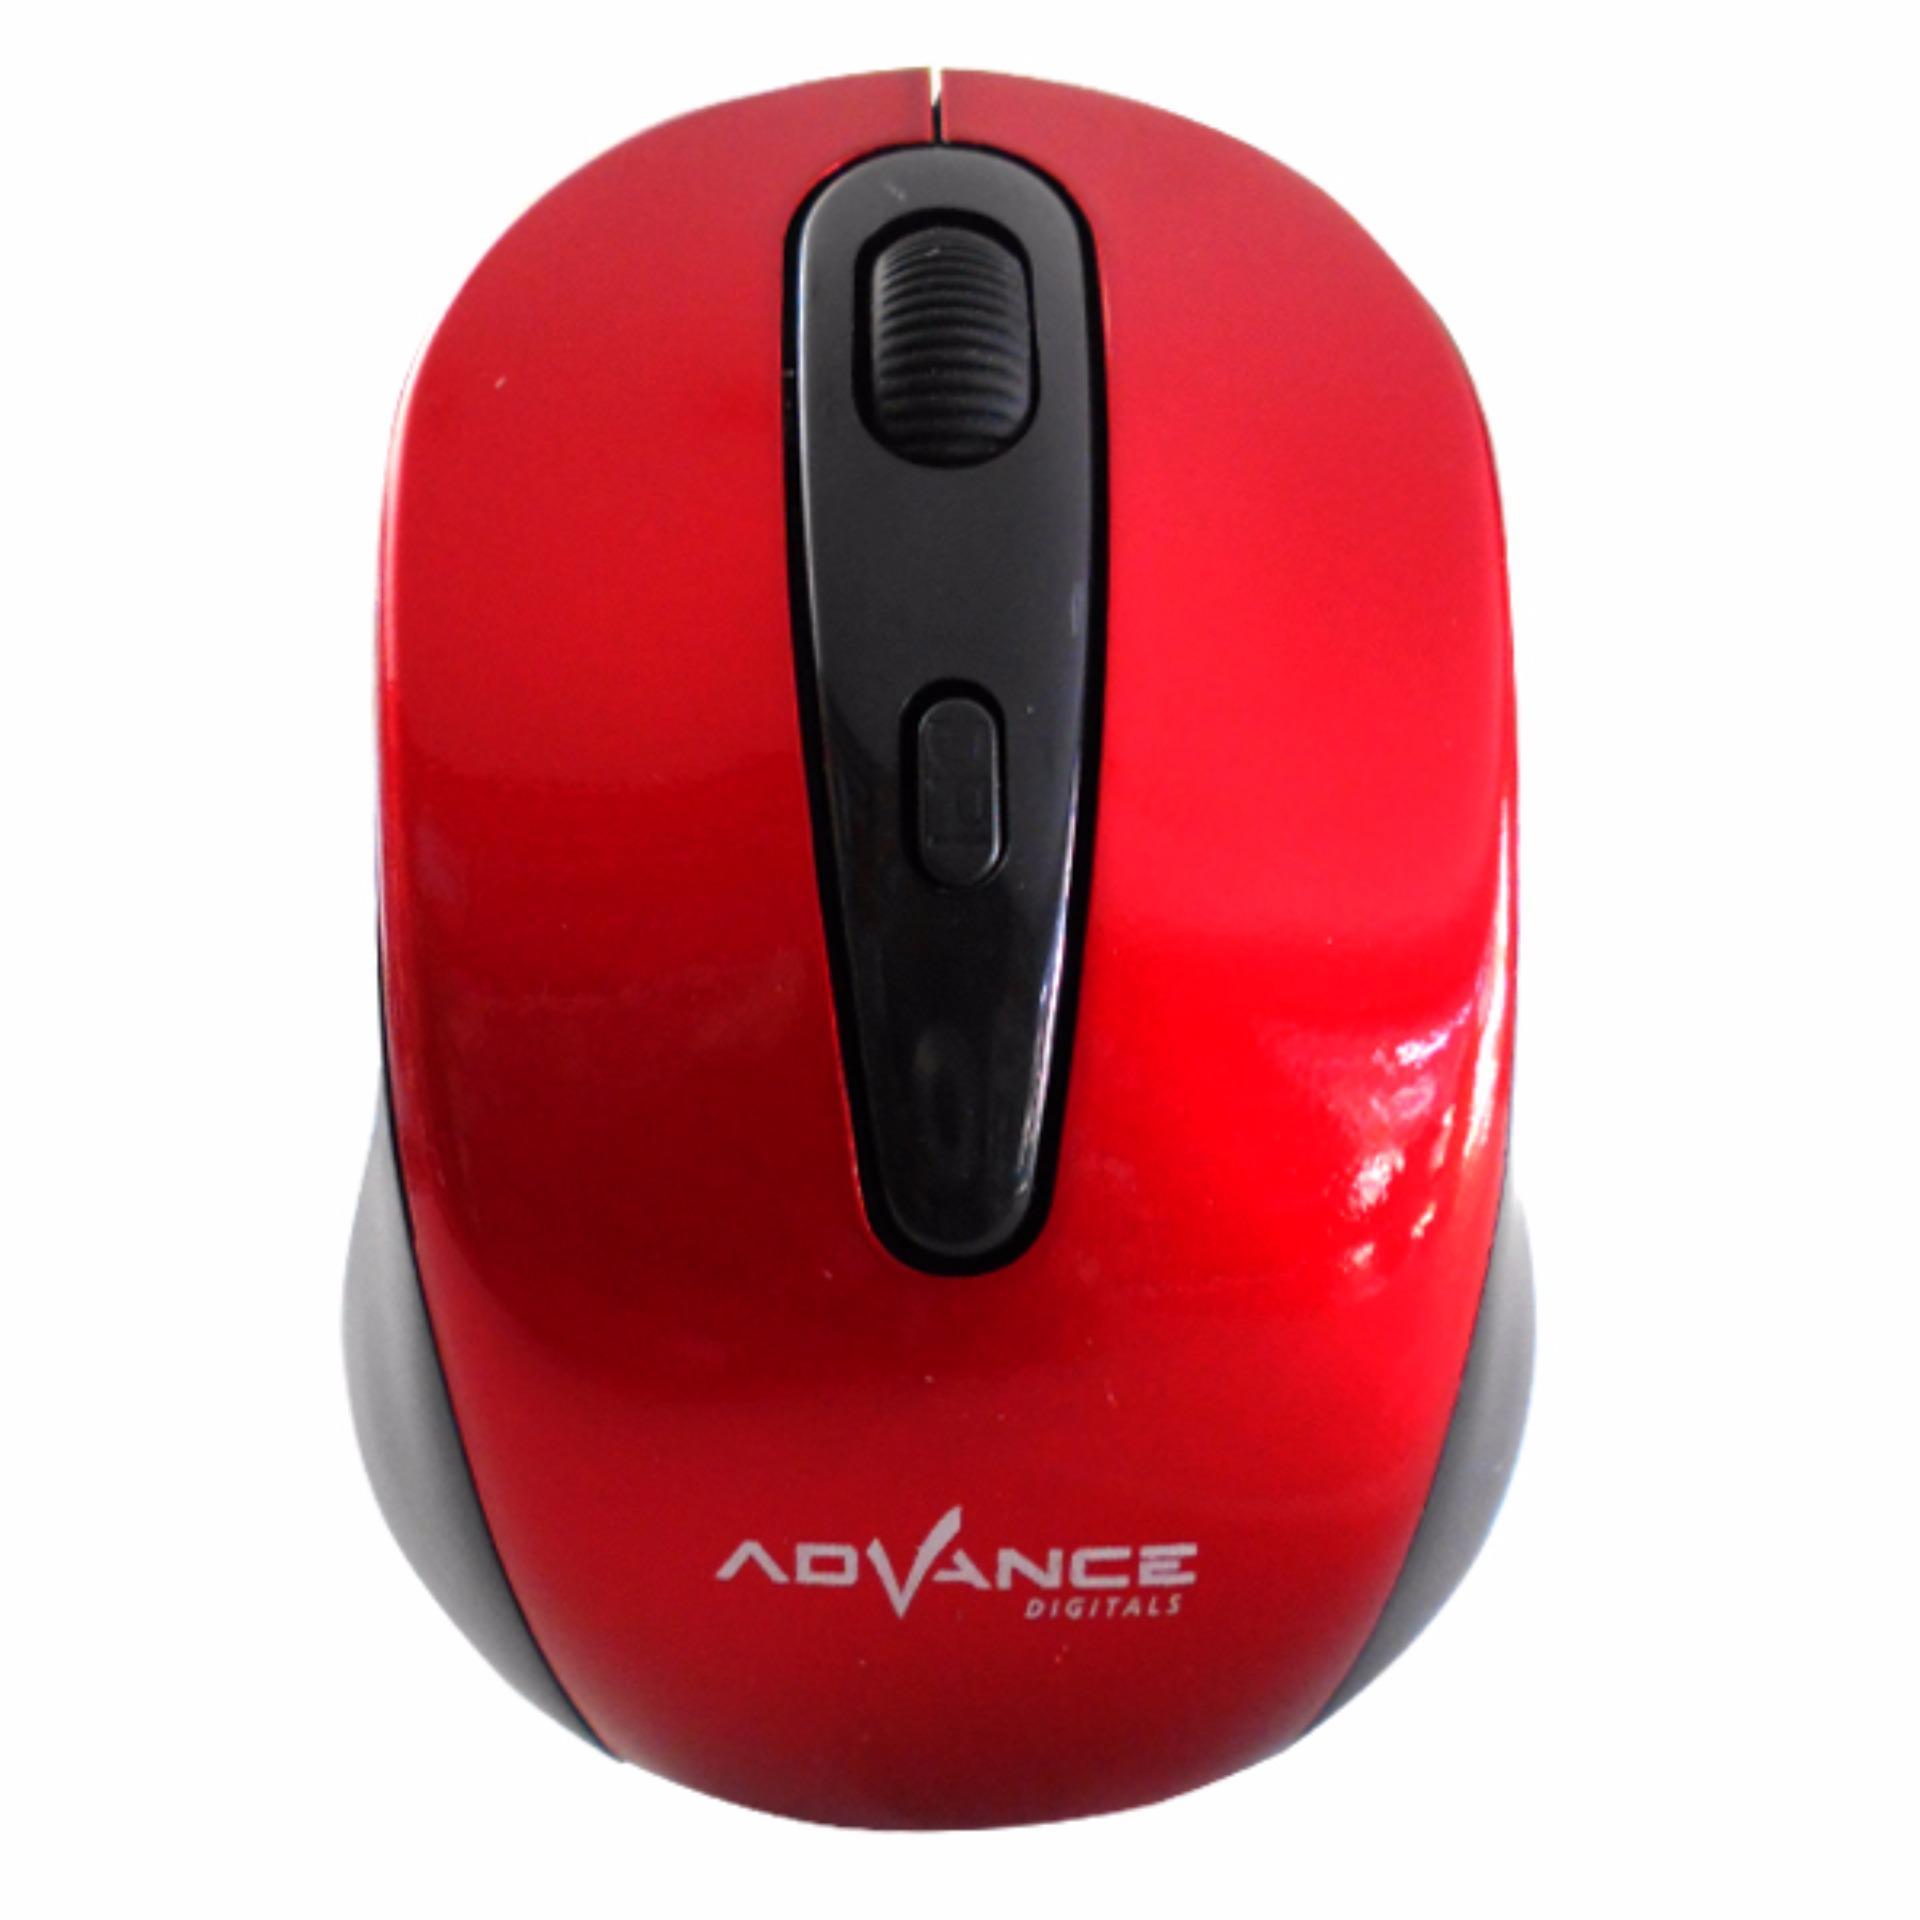 ... Advance Mouse Wireless Wm502 - B ...